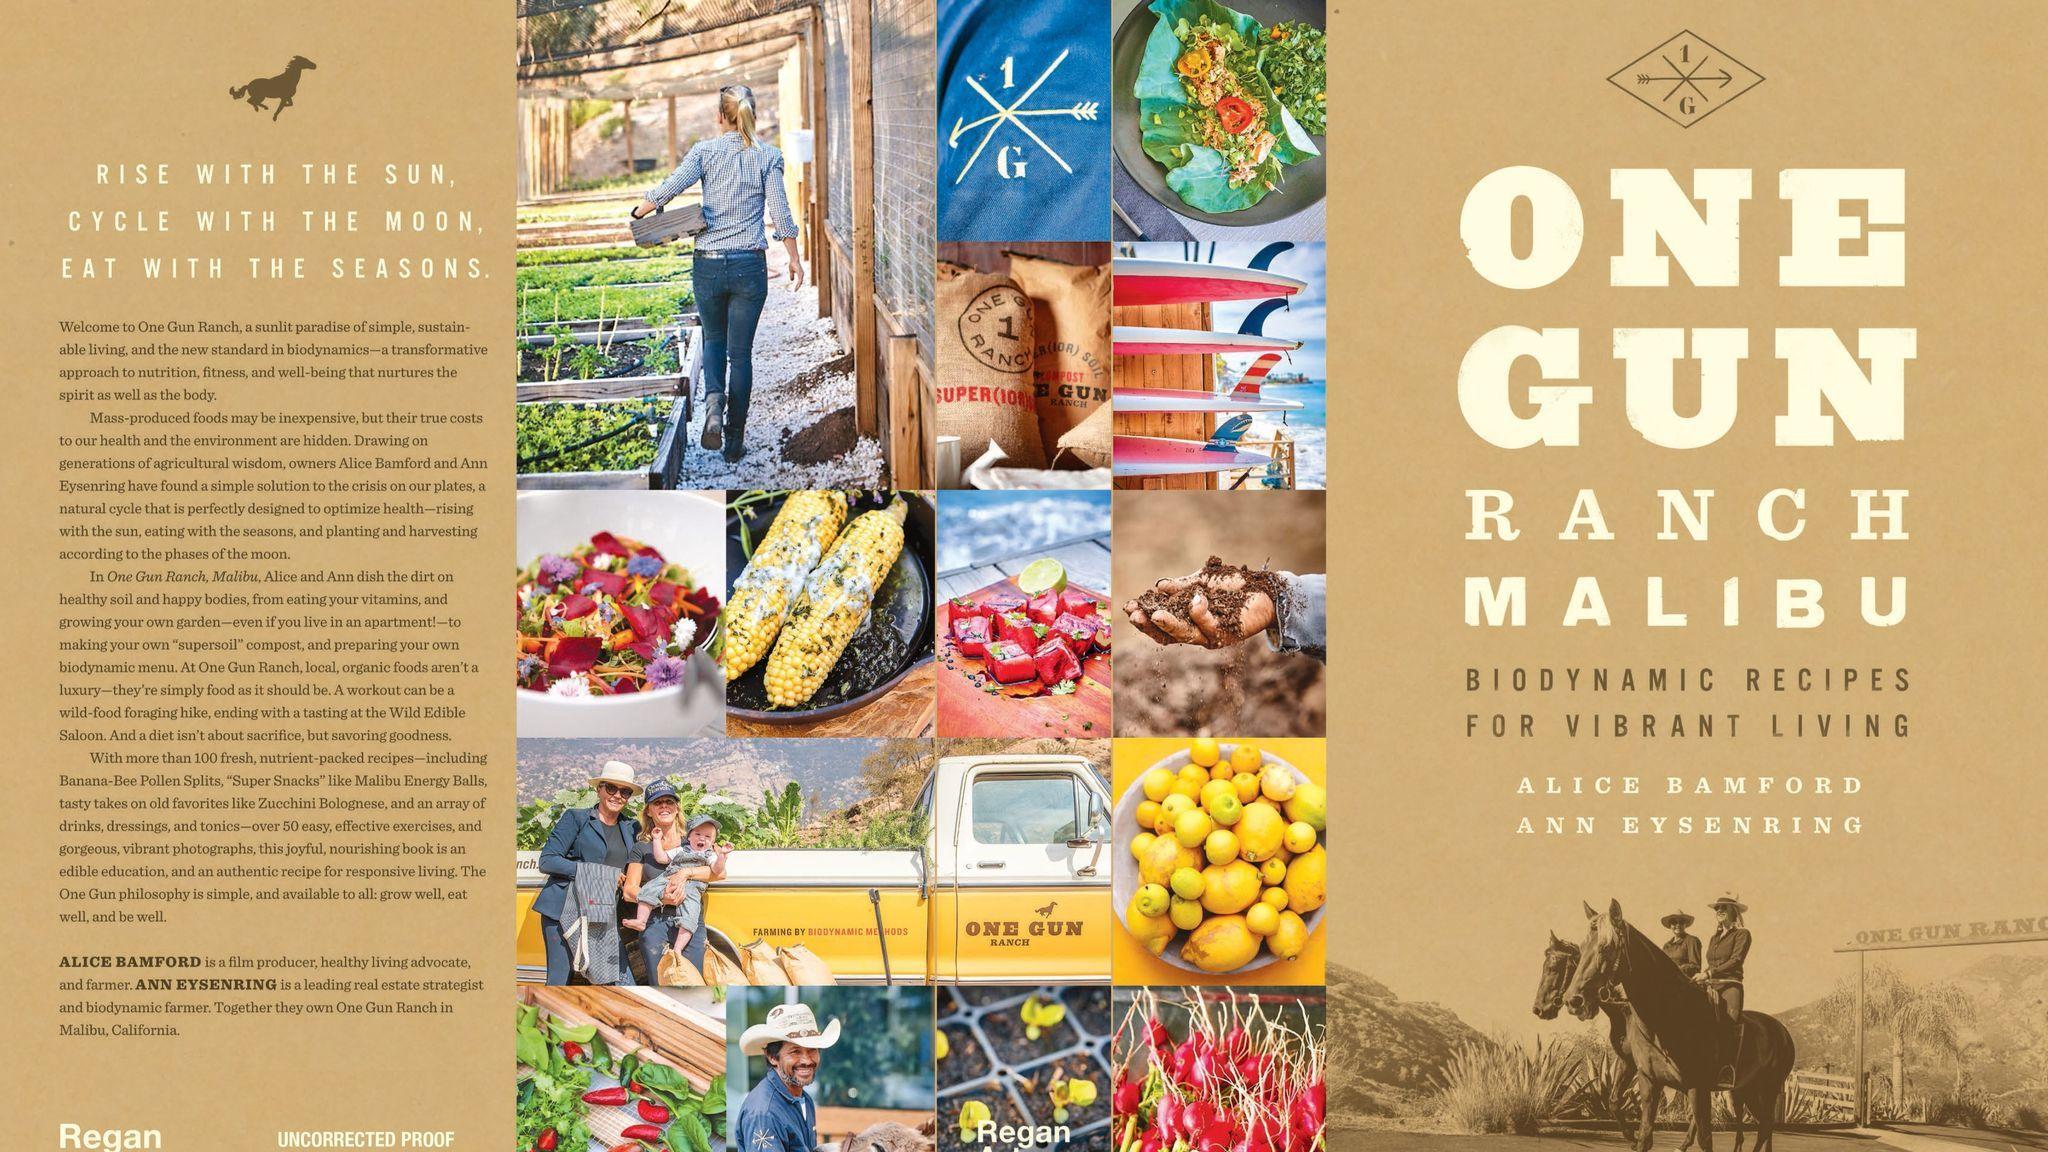 """One Gun Ranch Malibu: Biodynamic Recipes for Vibrant Living"" (Regan Arts, $40)"